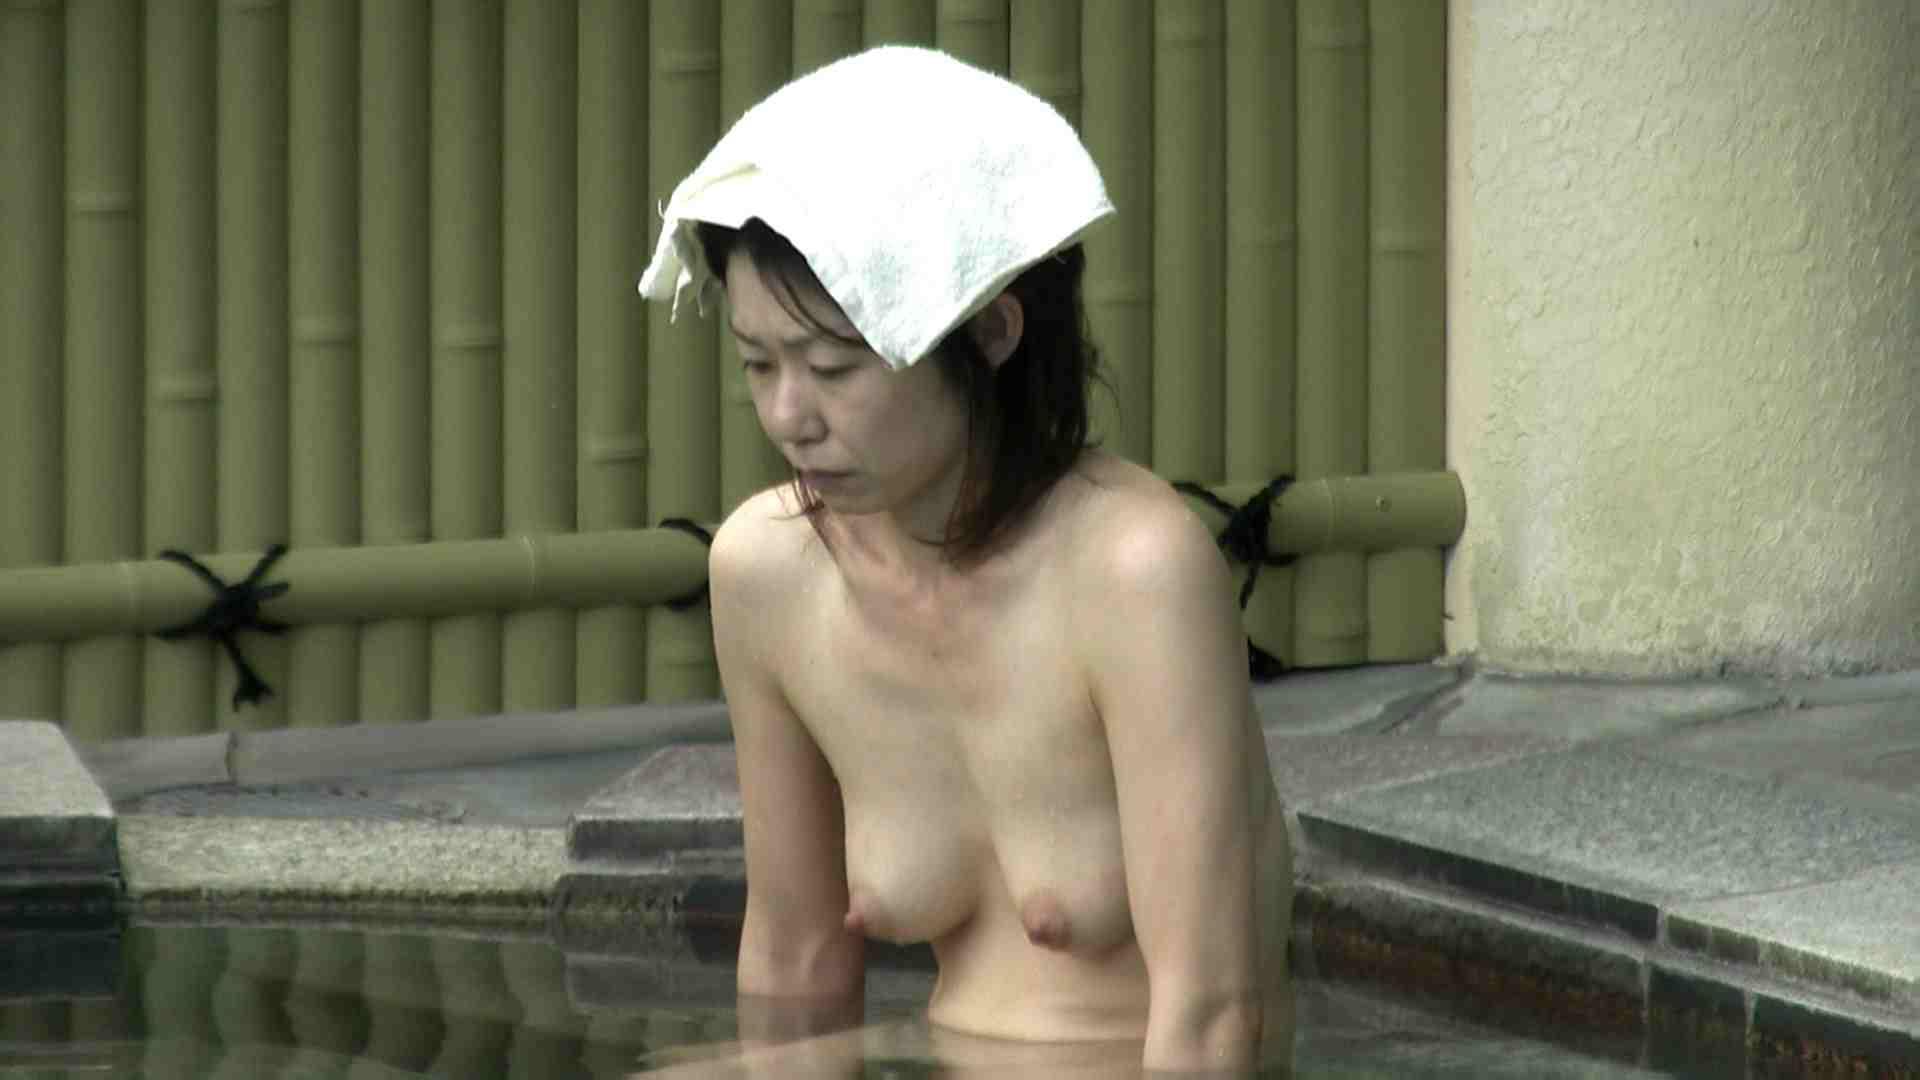 Aquaな露天風呂Vol.658 盗撮 おまんこ無修正動画無料 30連発 29